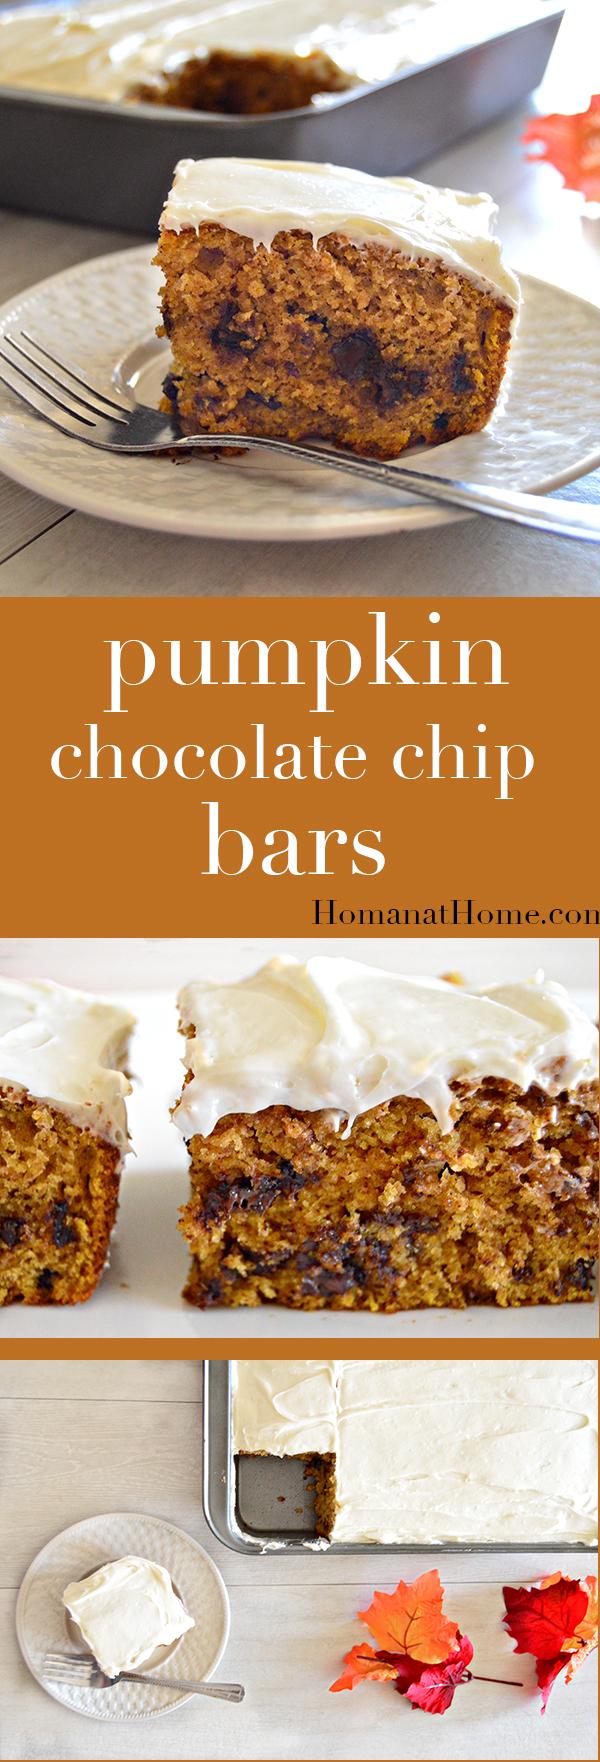 Pumpkin Chocolate Chip Bars | Homan at Home